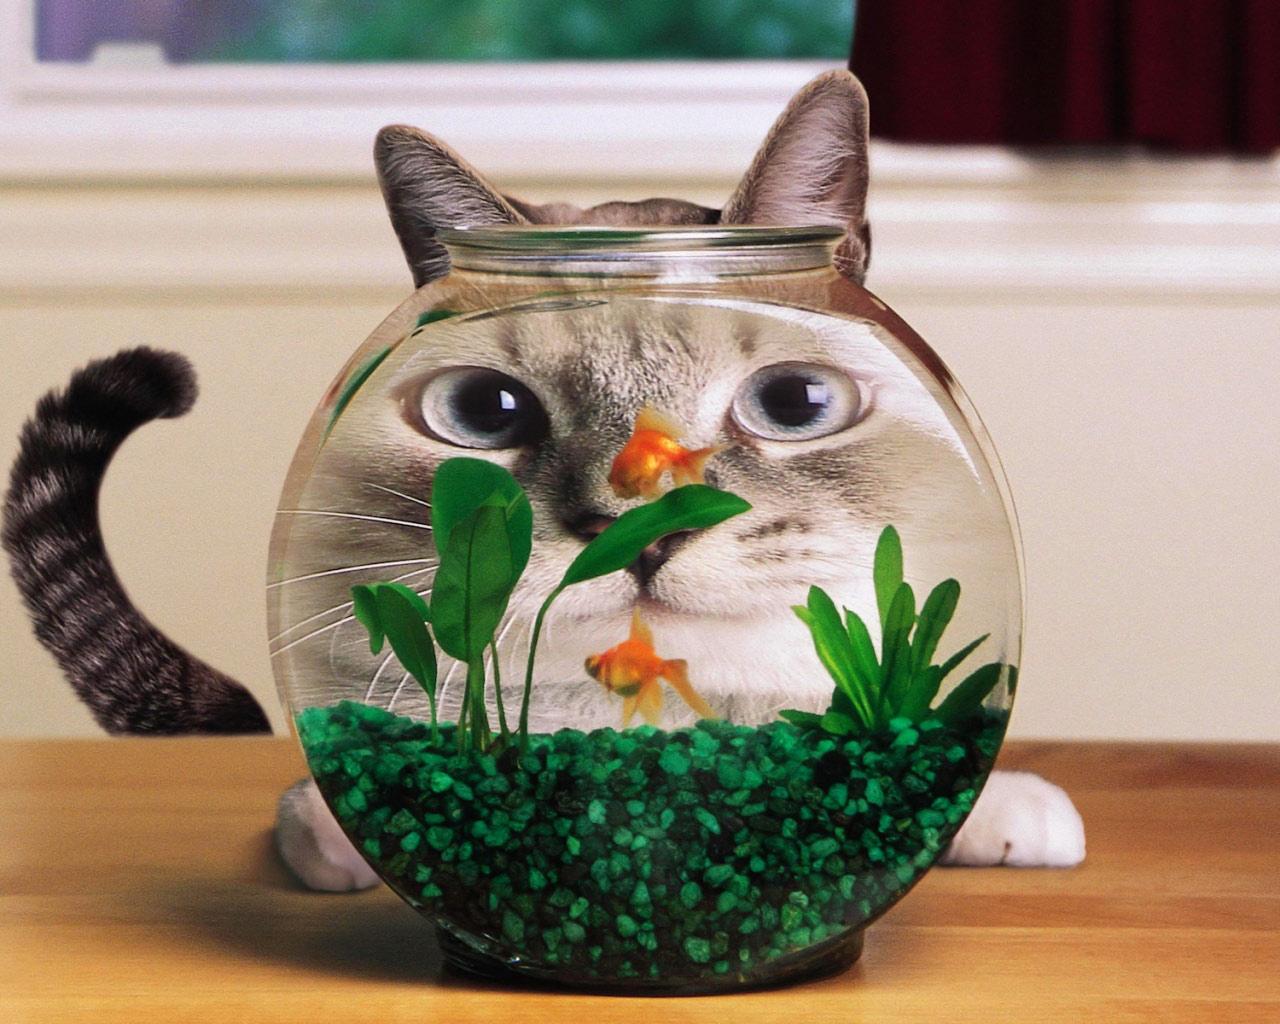 Cat and Fish Funny    Top Wallpapers Download .blogspot.com